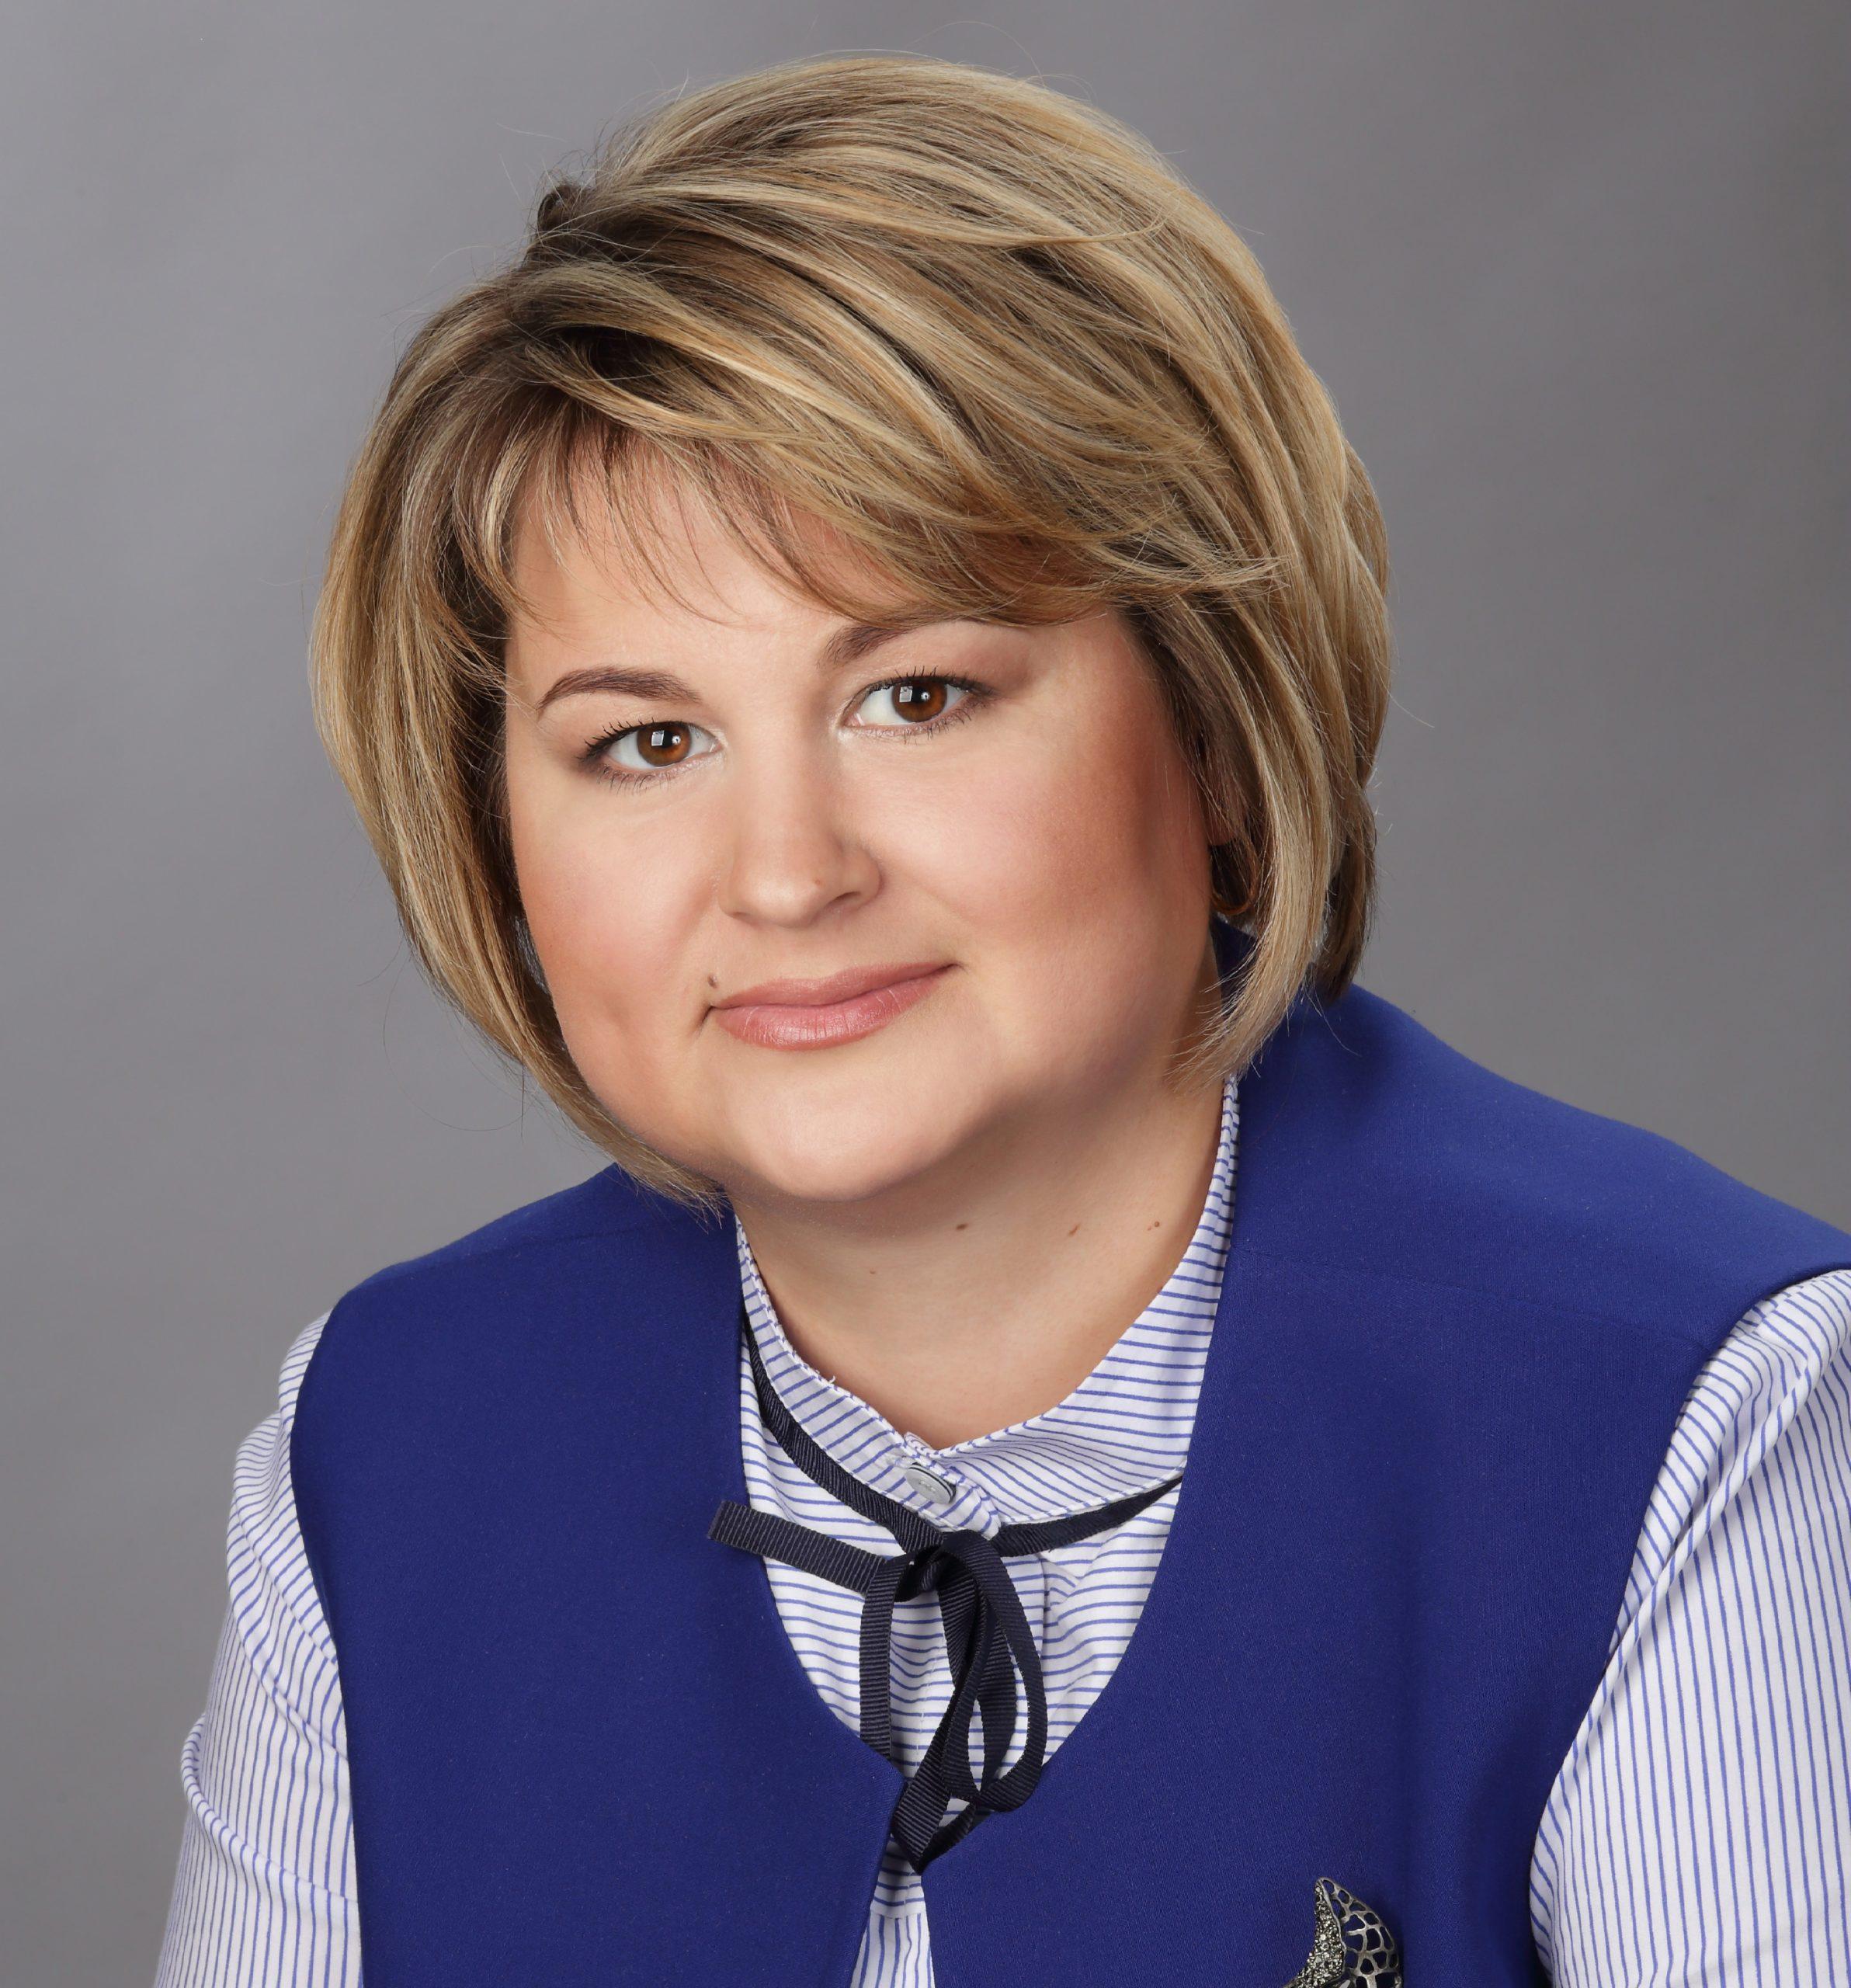 Ермолаева Екатерина Олеговна